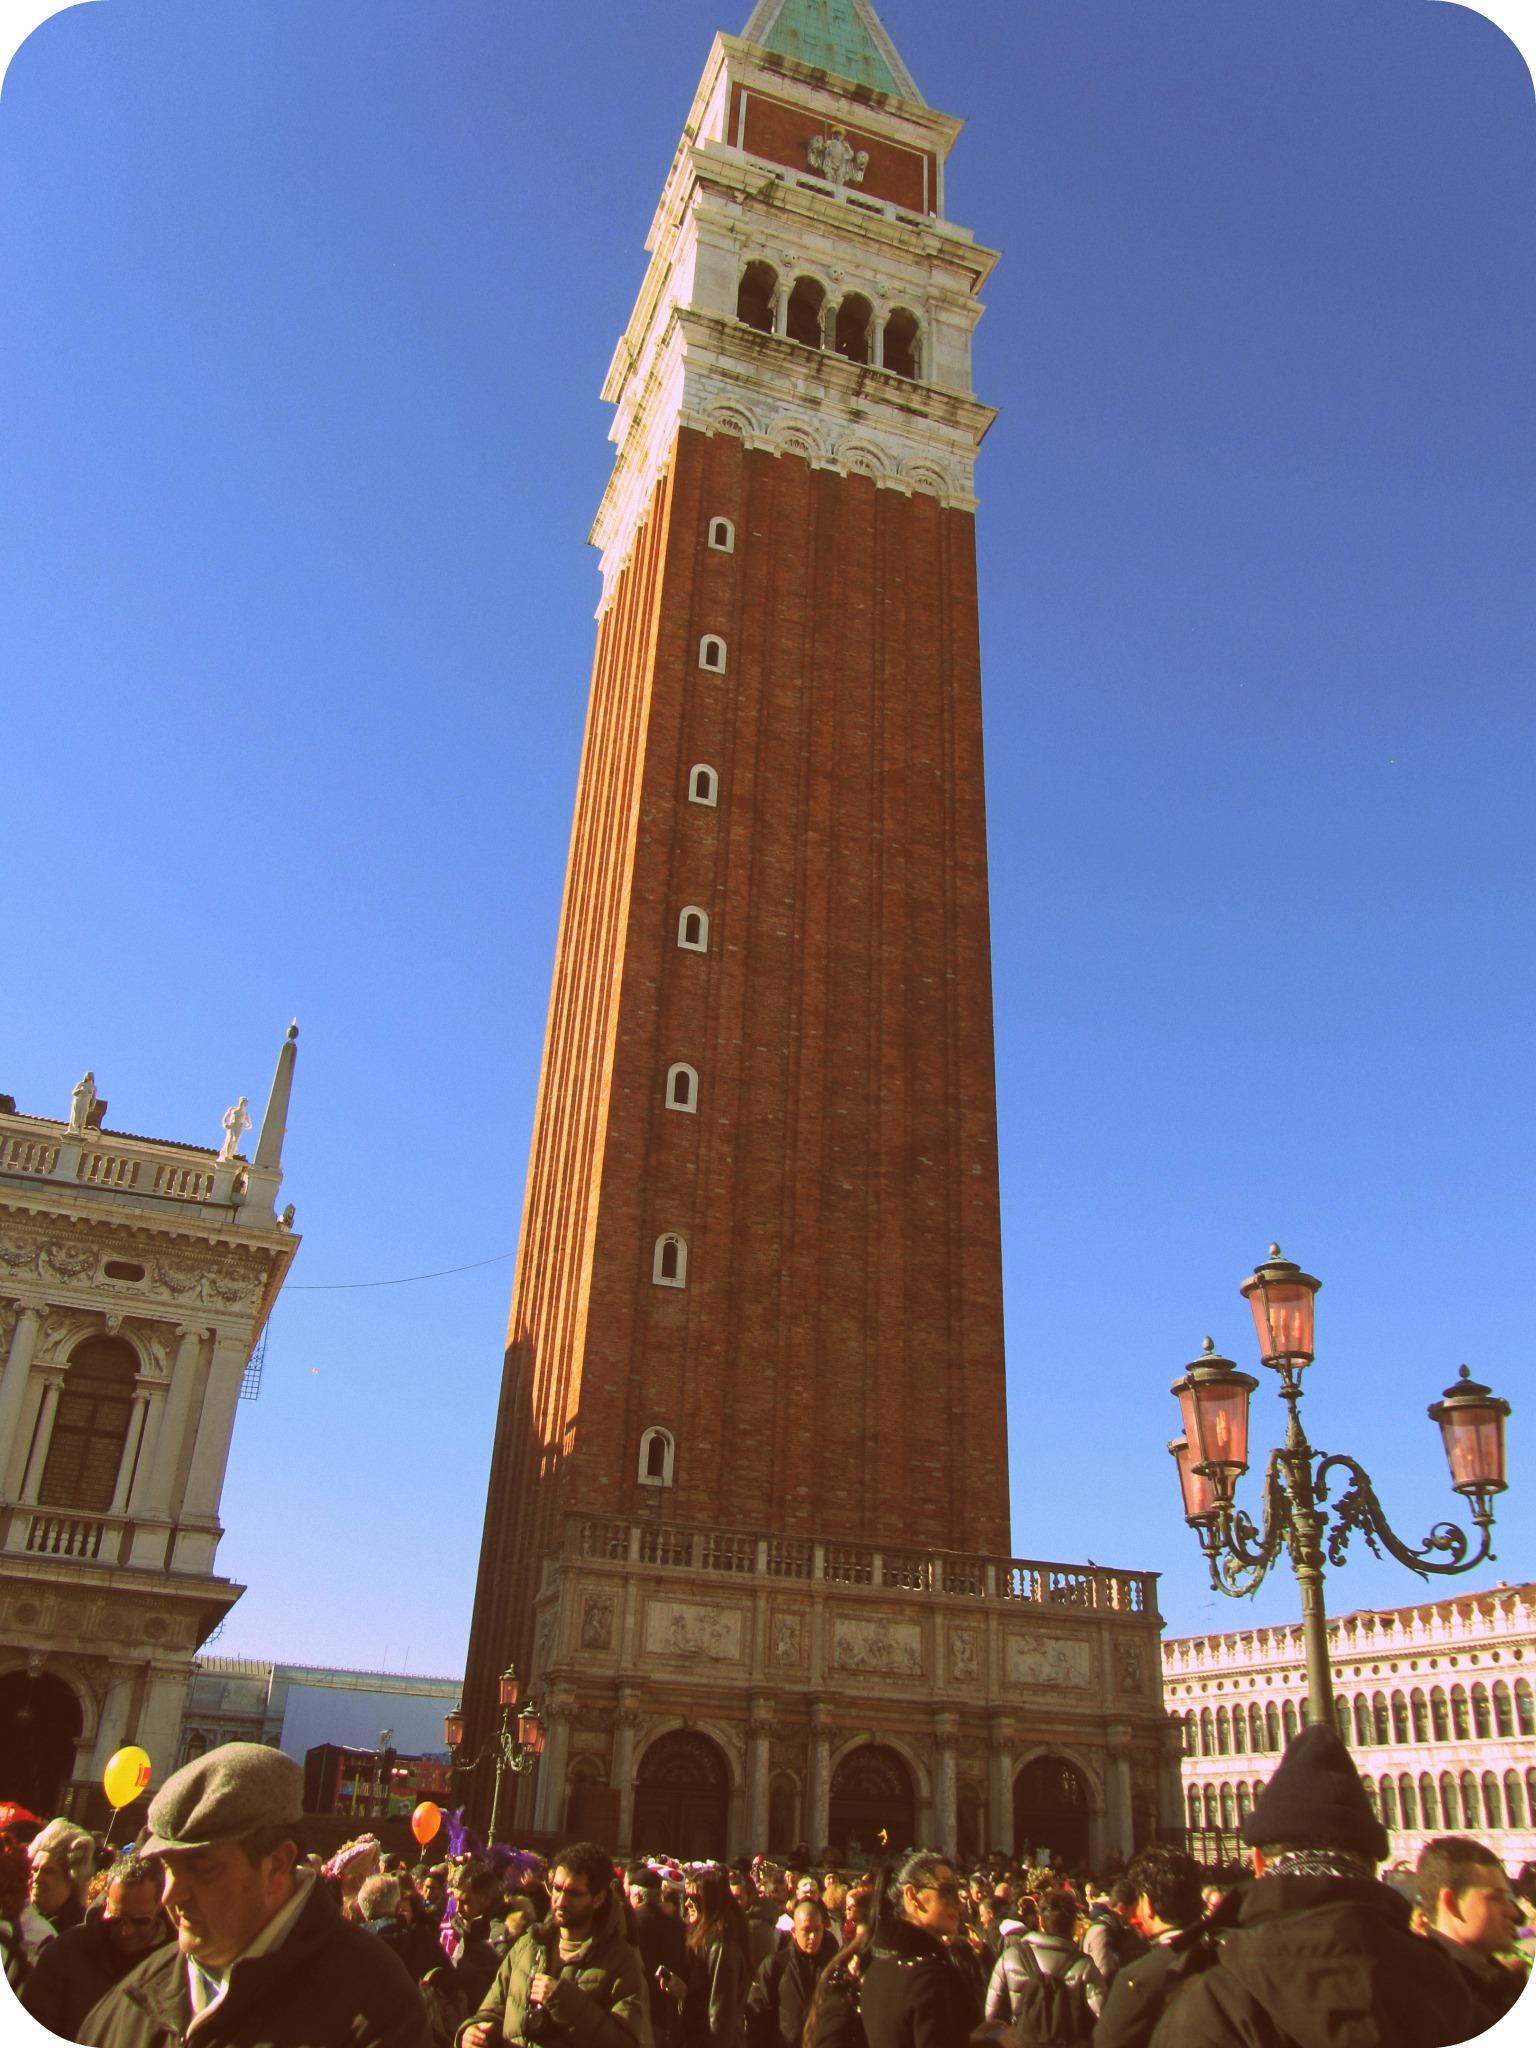 Piazza San Marco Carnevale 2013 PopupVenice